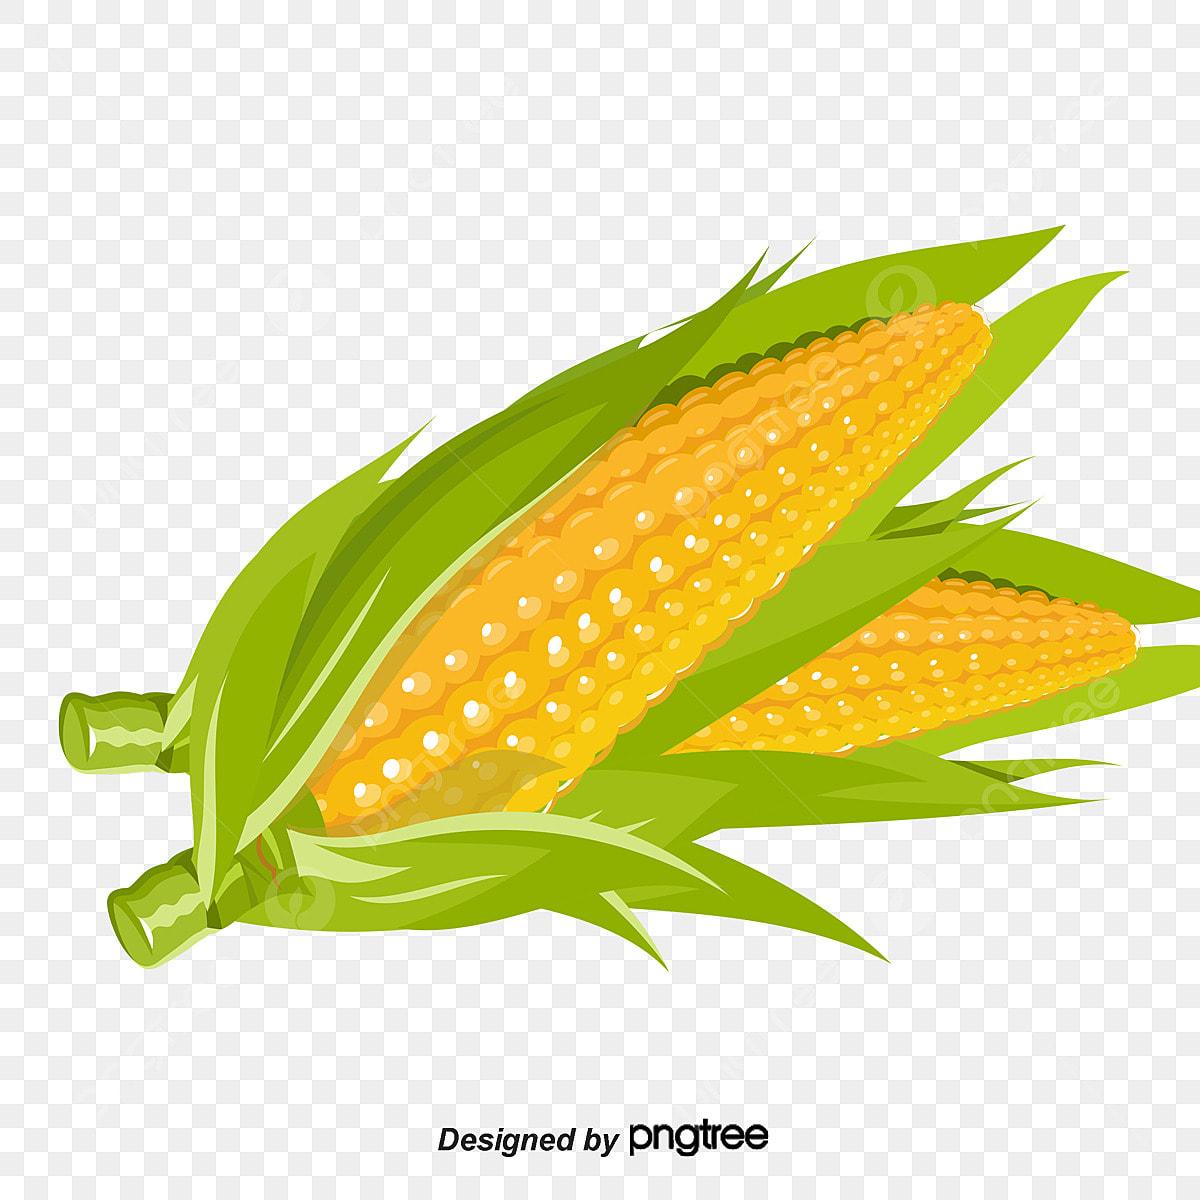 Maize Clip Art - Transparent Background Corn Clipart, HD Png Download -  kindpng